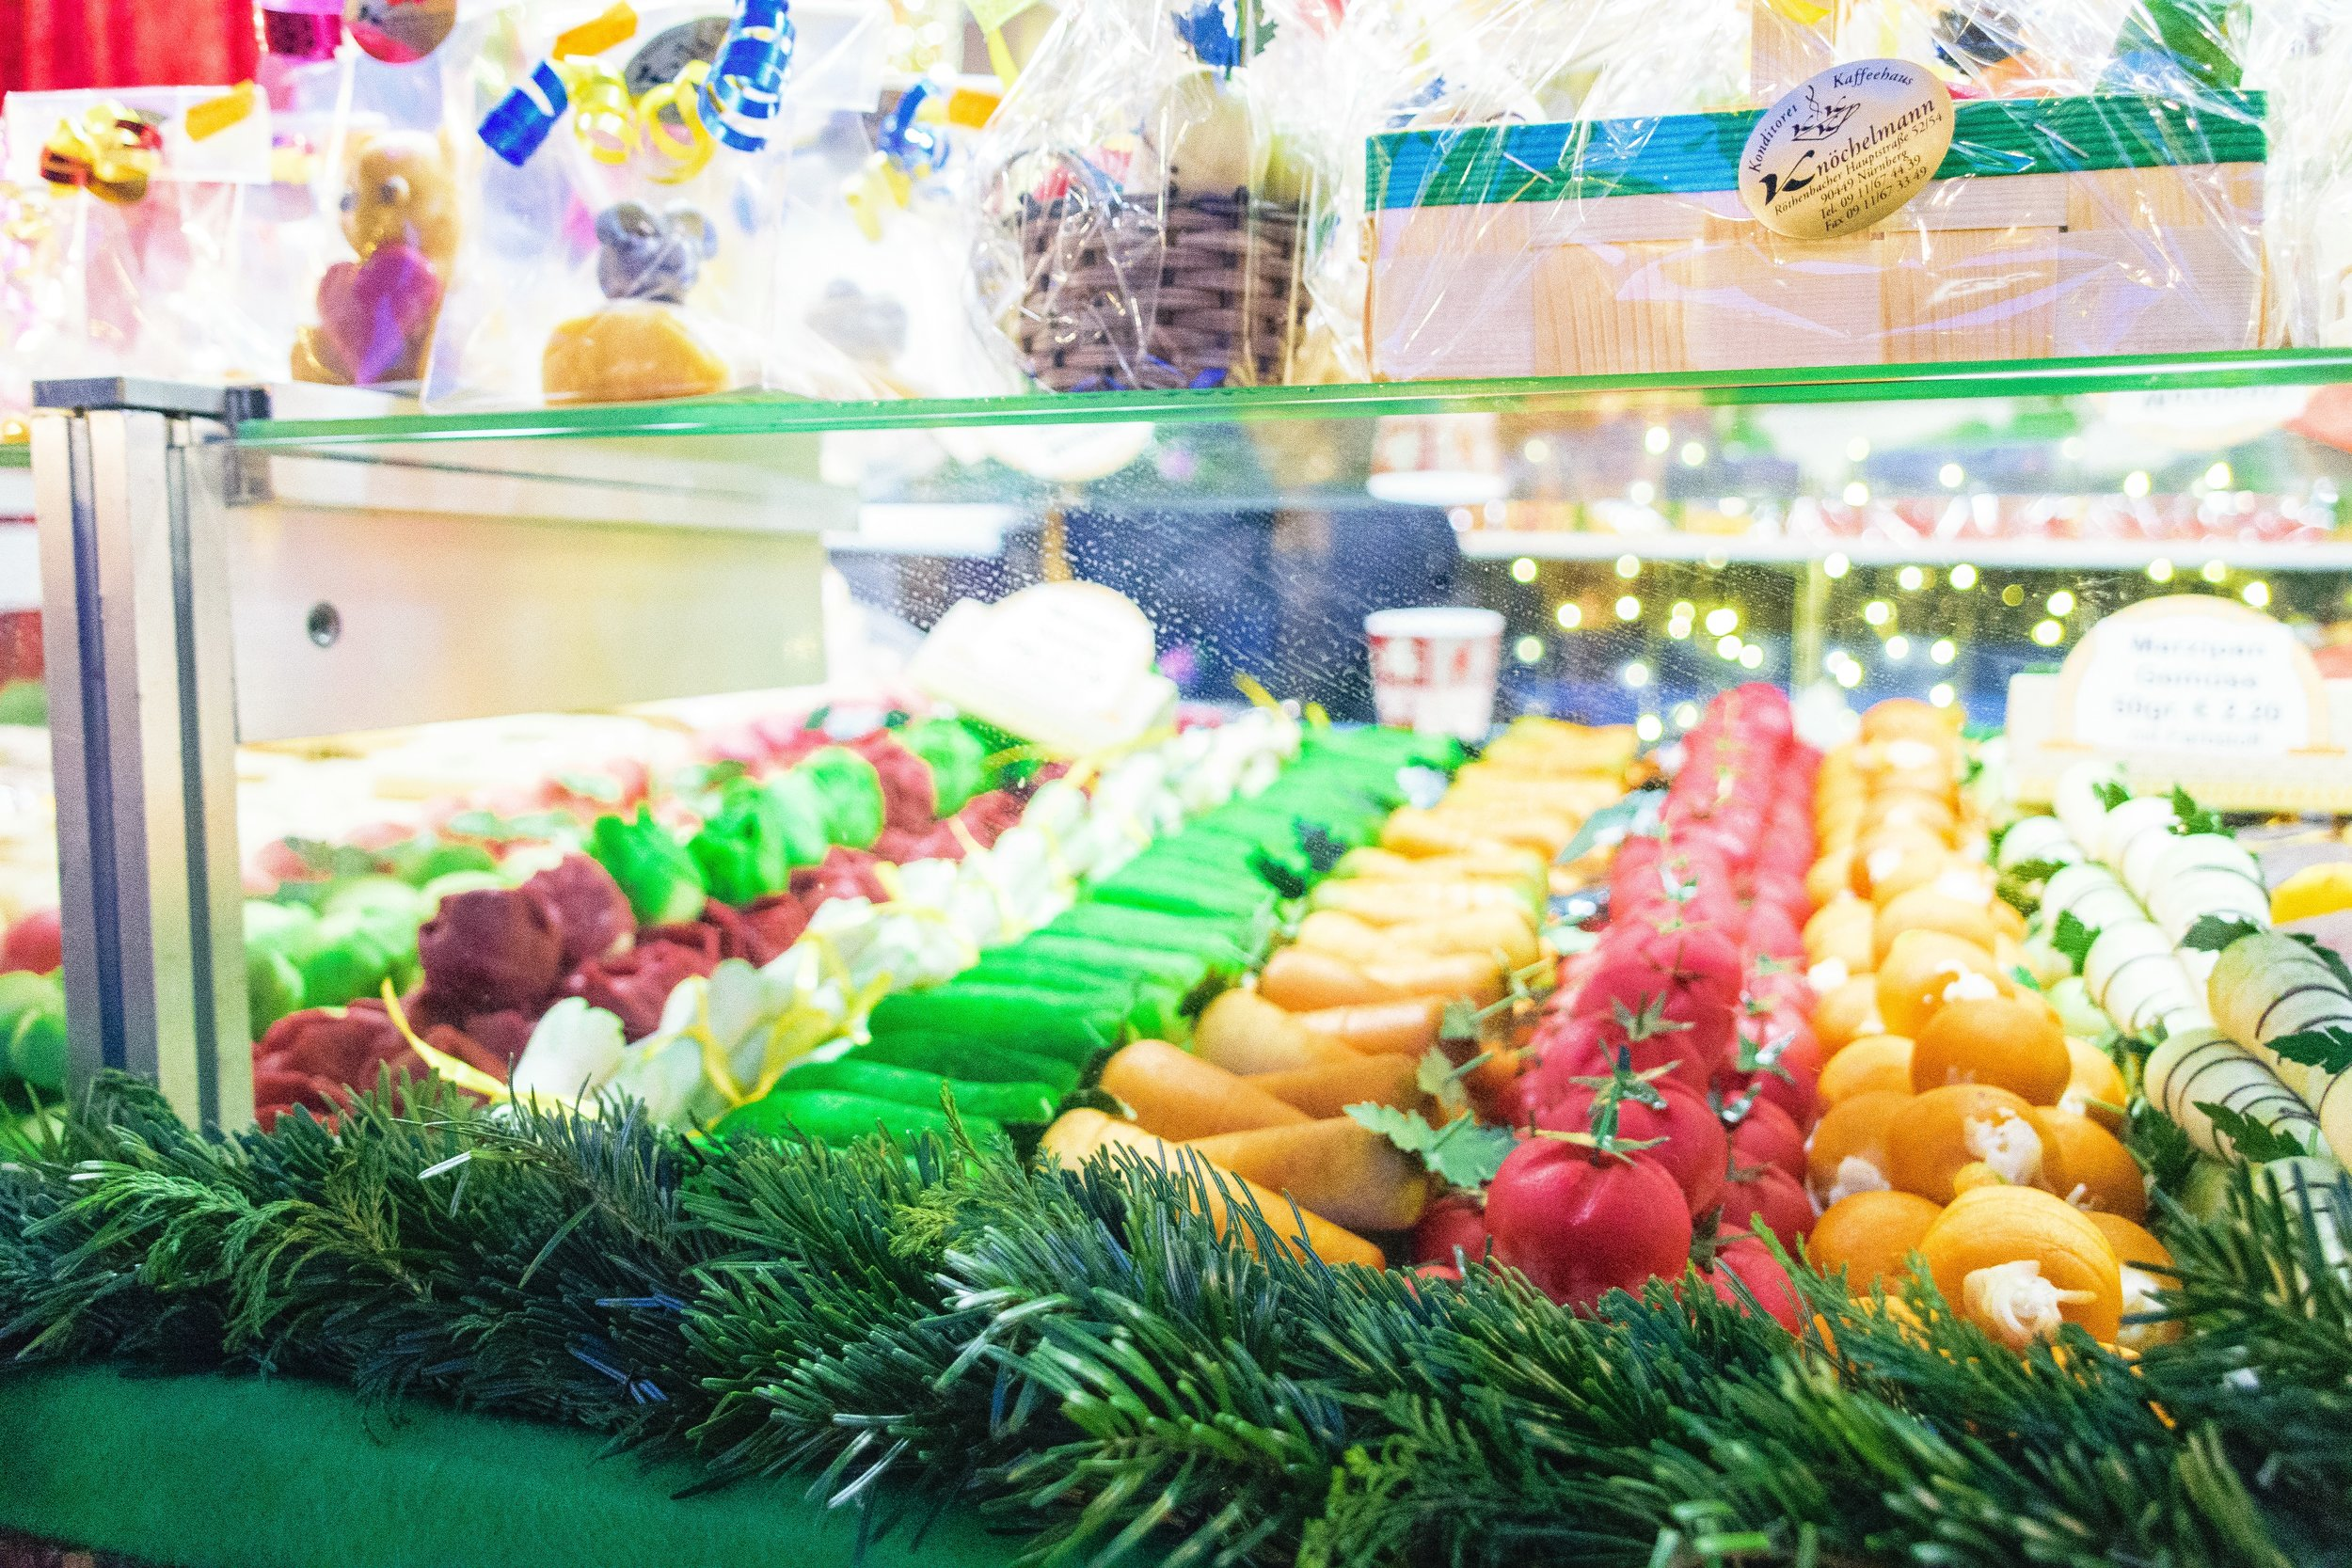 marzipan fruits & veggies